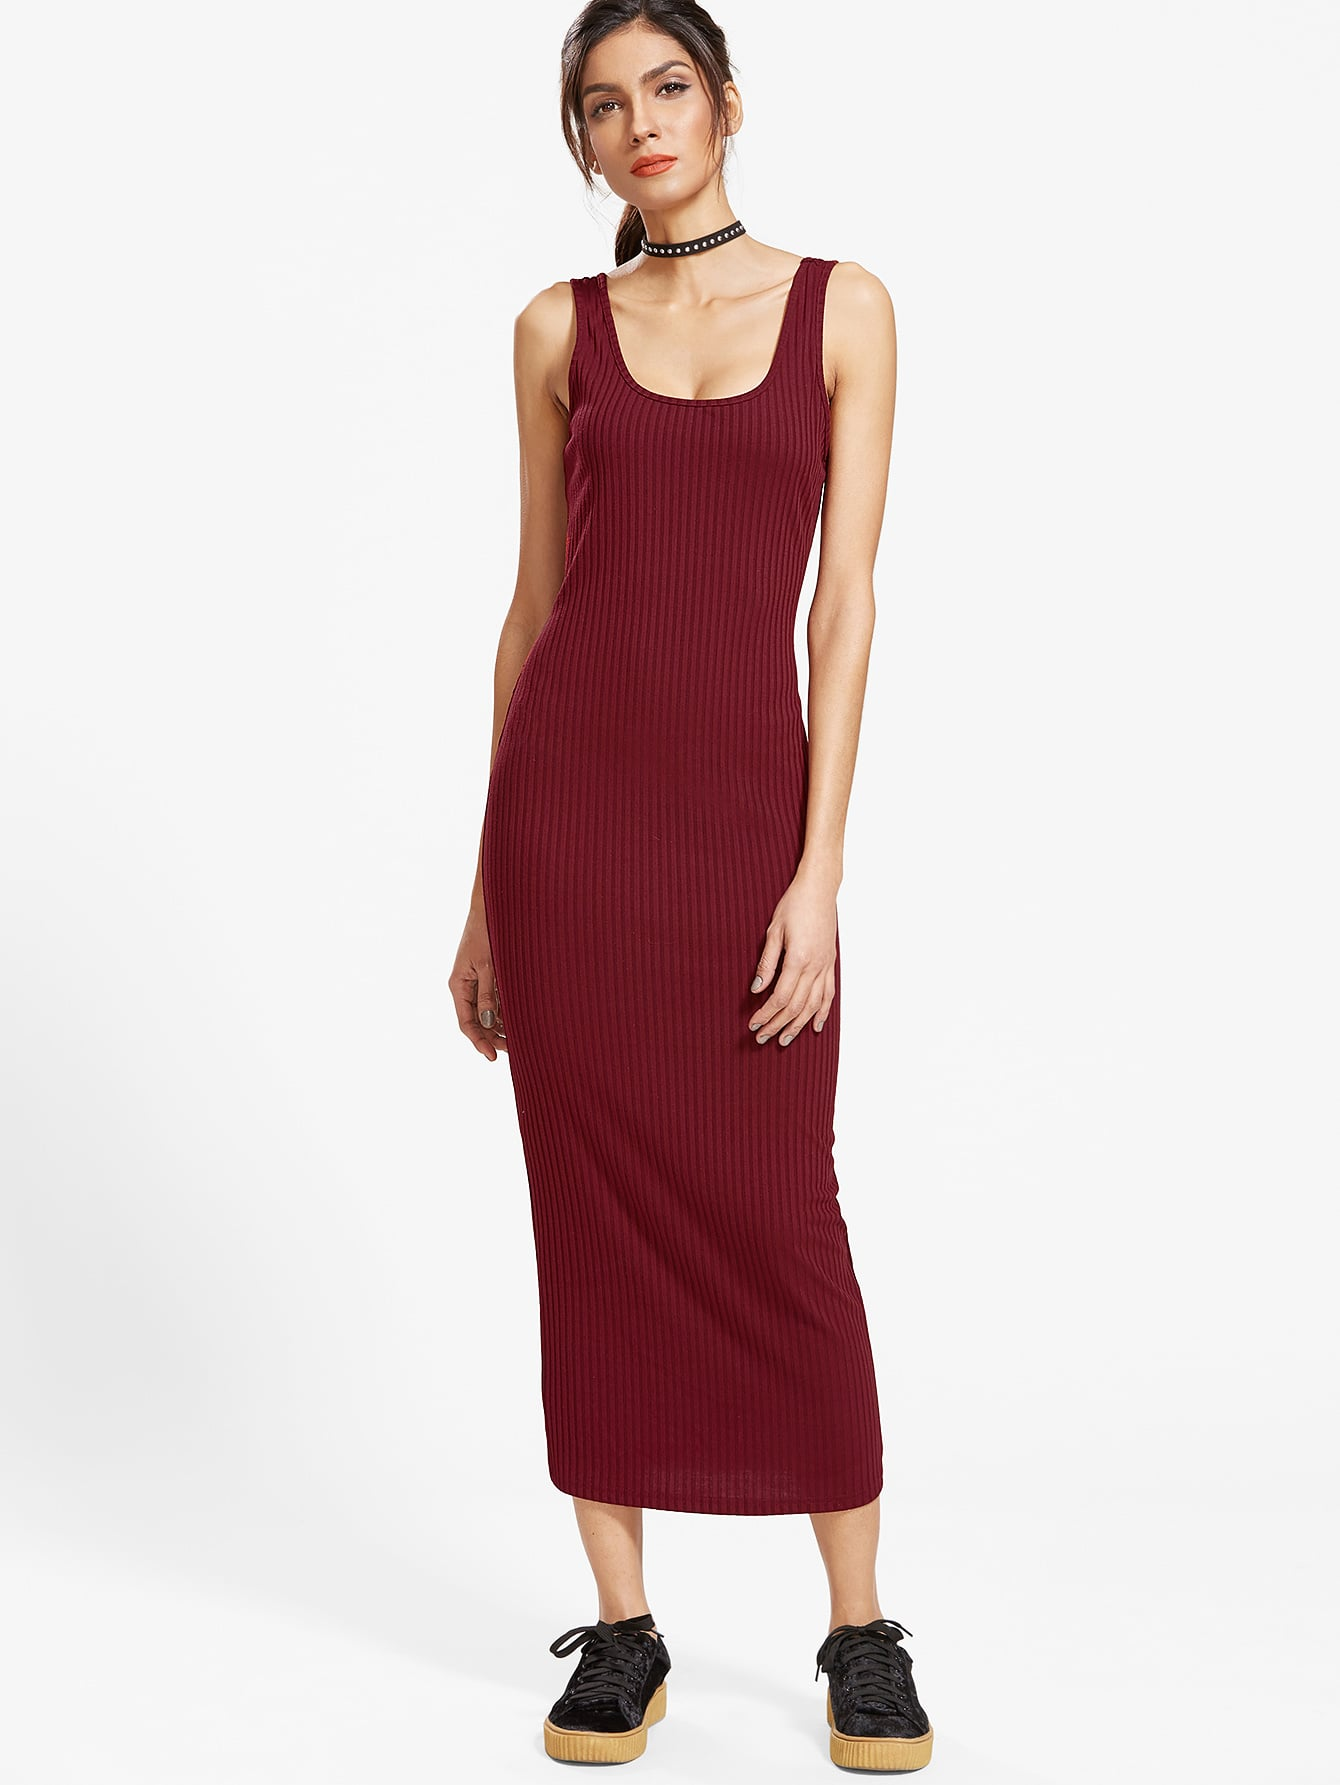 Burgundy Ribbed Knit Double Scoop Neck Tank Dress dress161227708